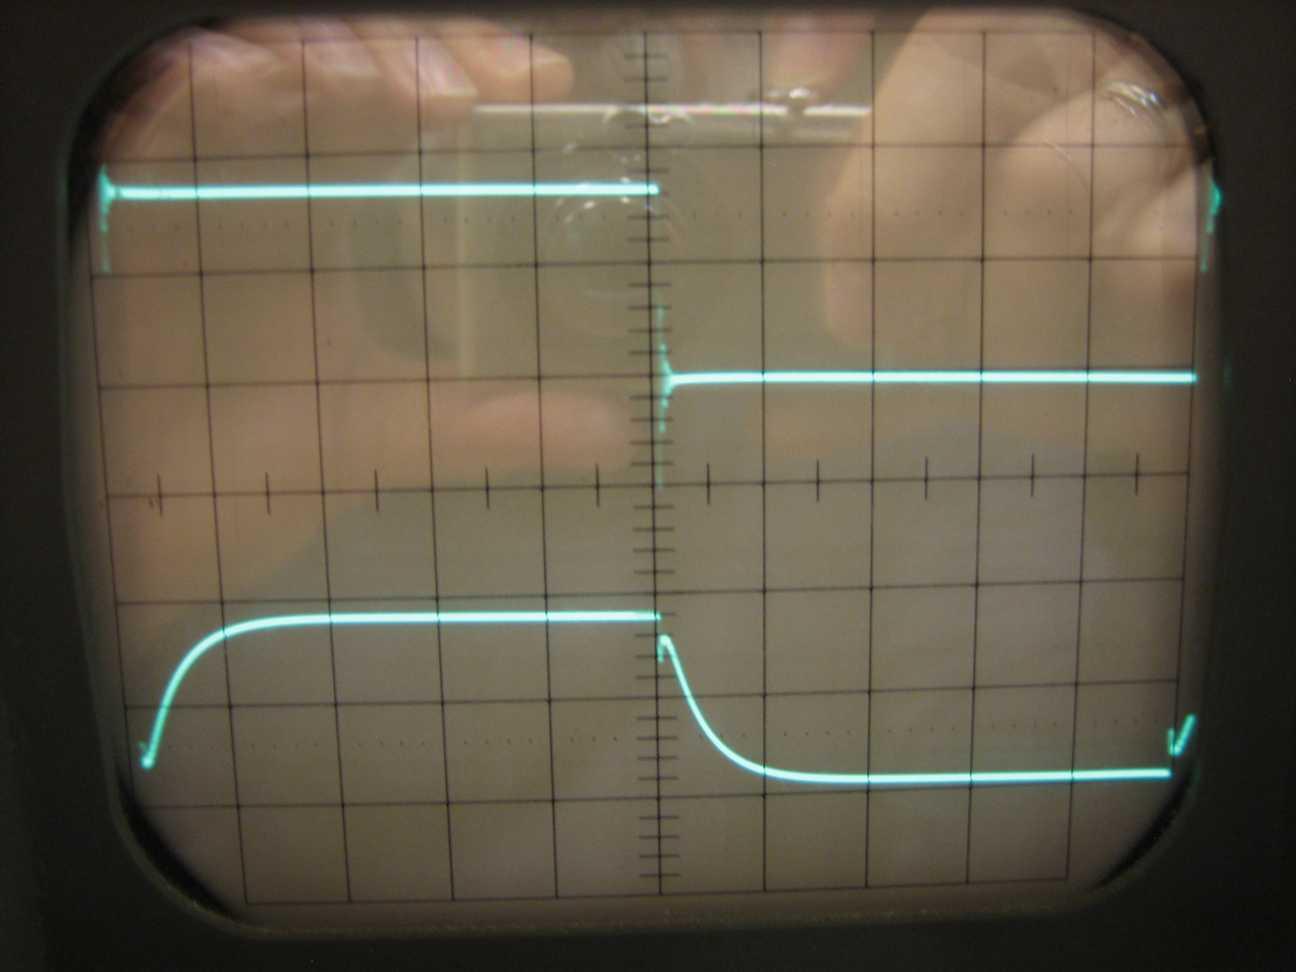 Oben: PWM. Unten: Spannung hinter der Spule an 1KΩ. Horizontal 5µs/cm. Vertikal 2V/cm